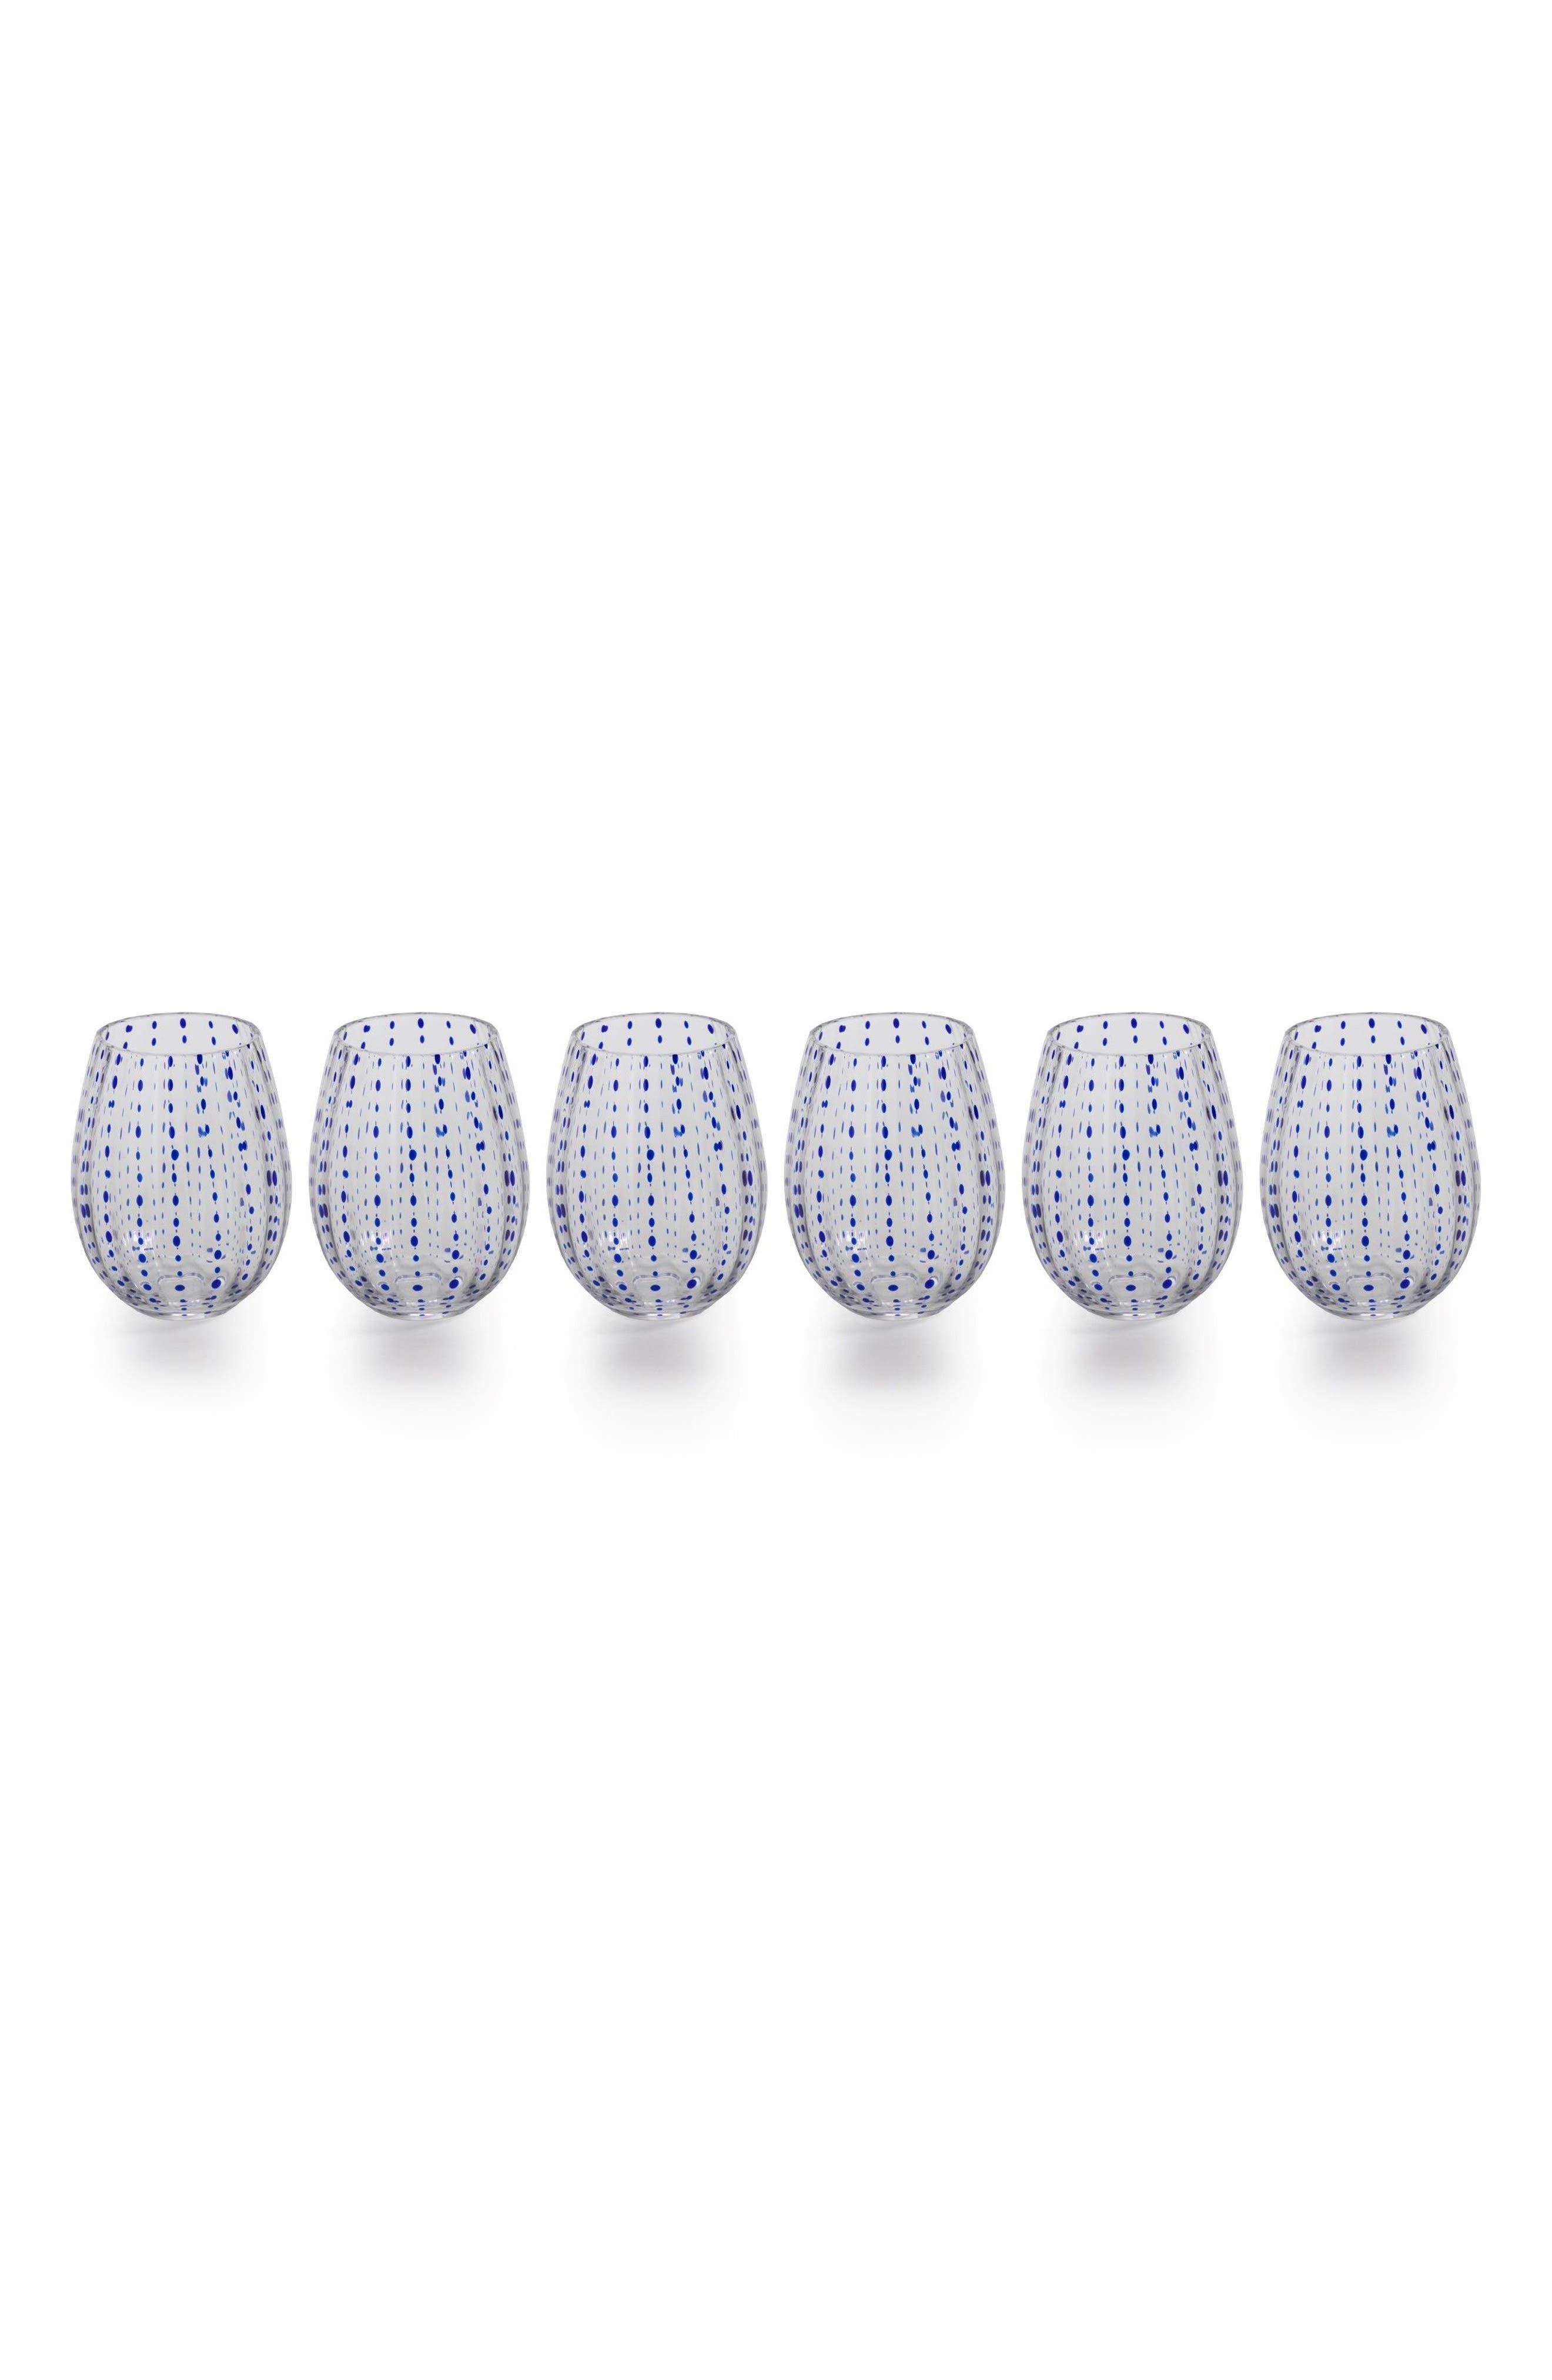 Main Image - Zodax Mavi Set of 6 Stemless Wine Glasses